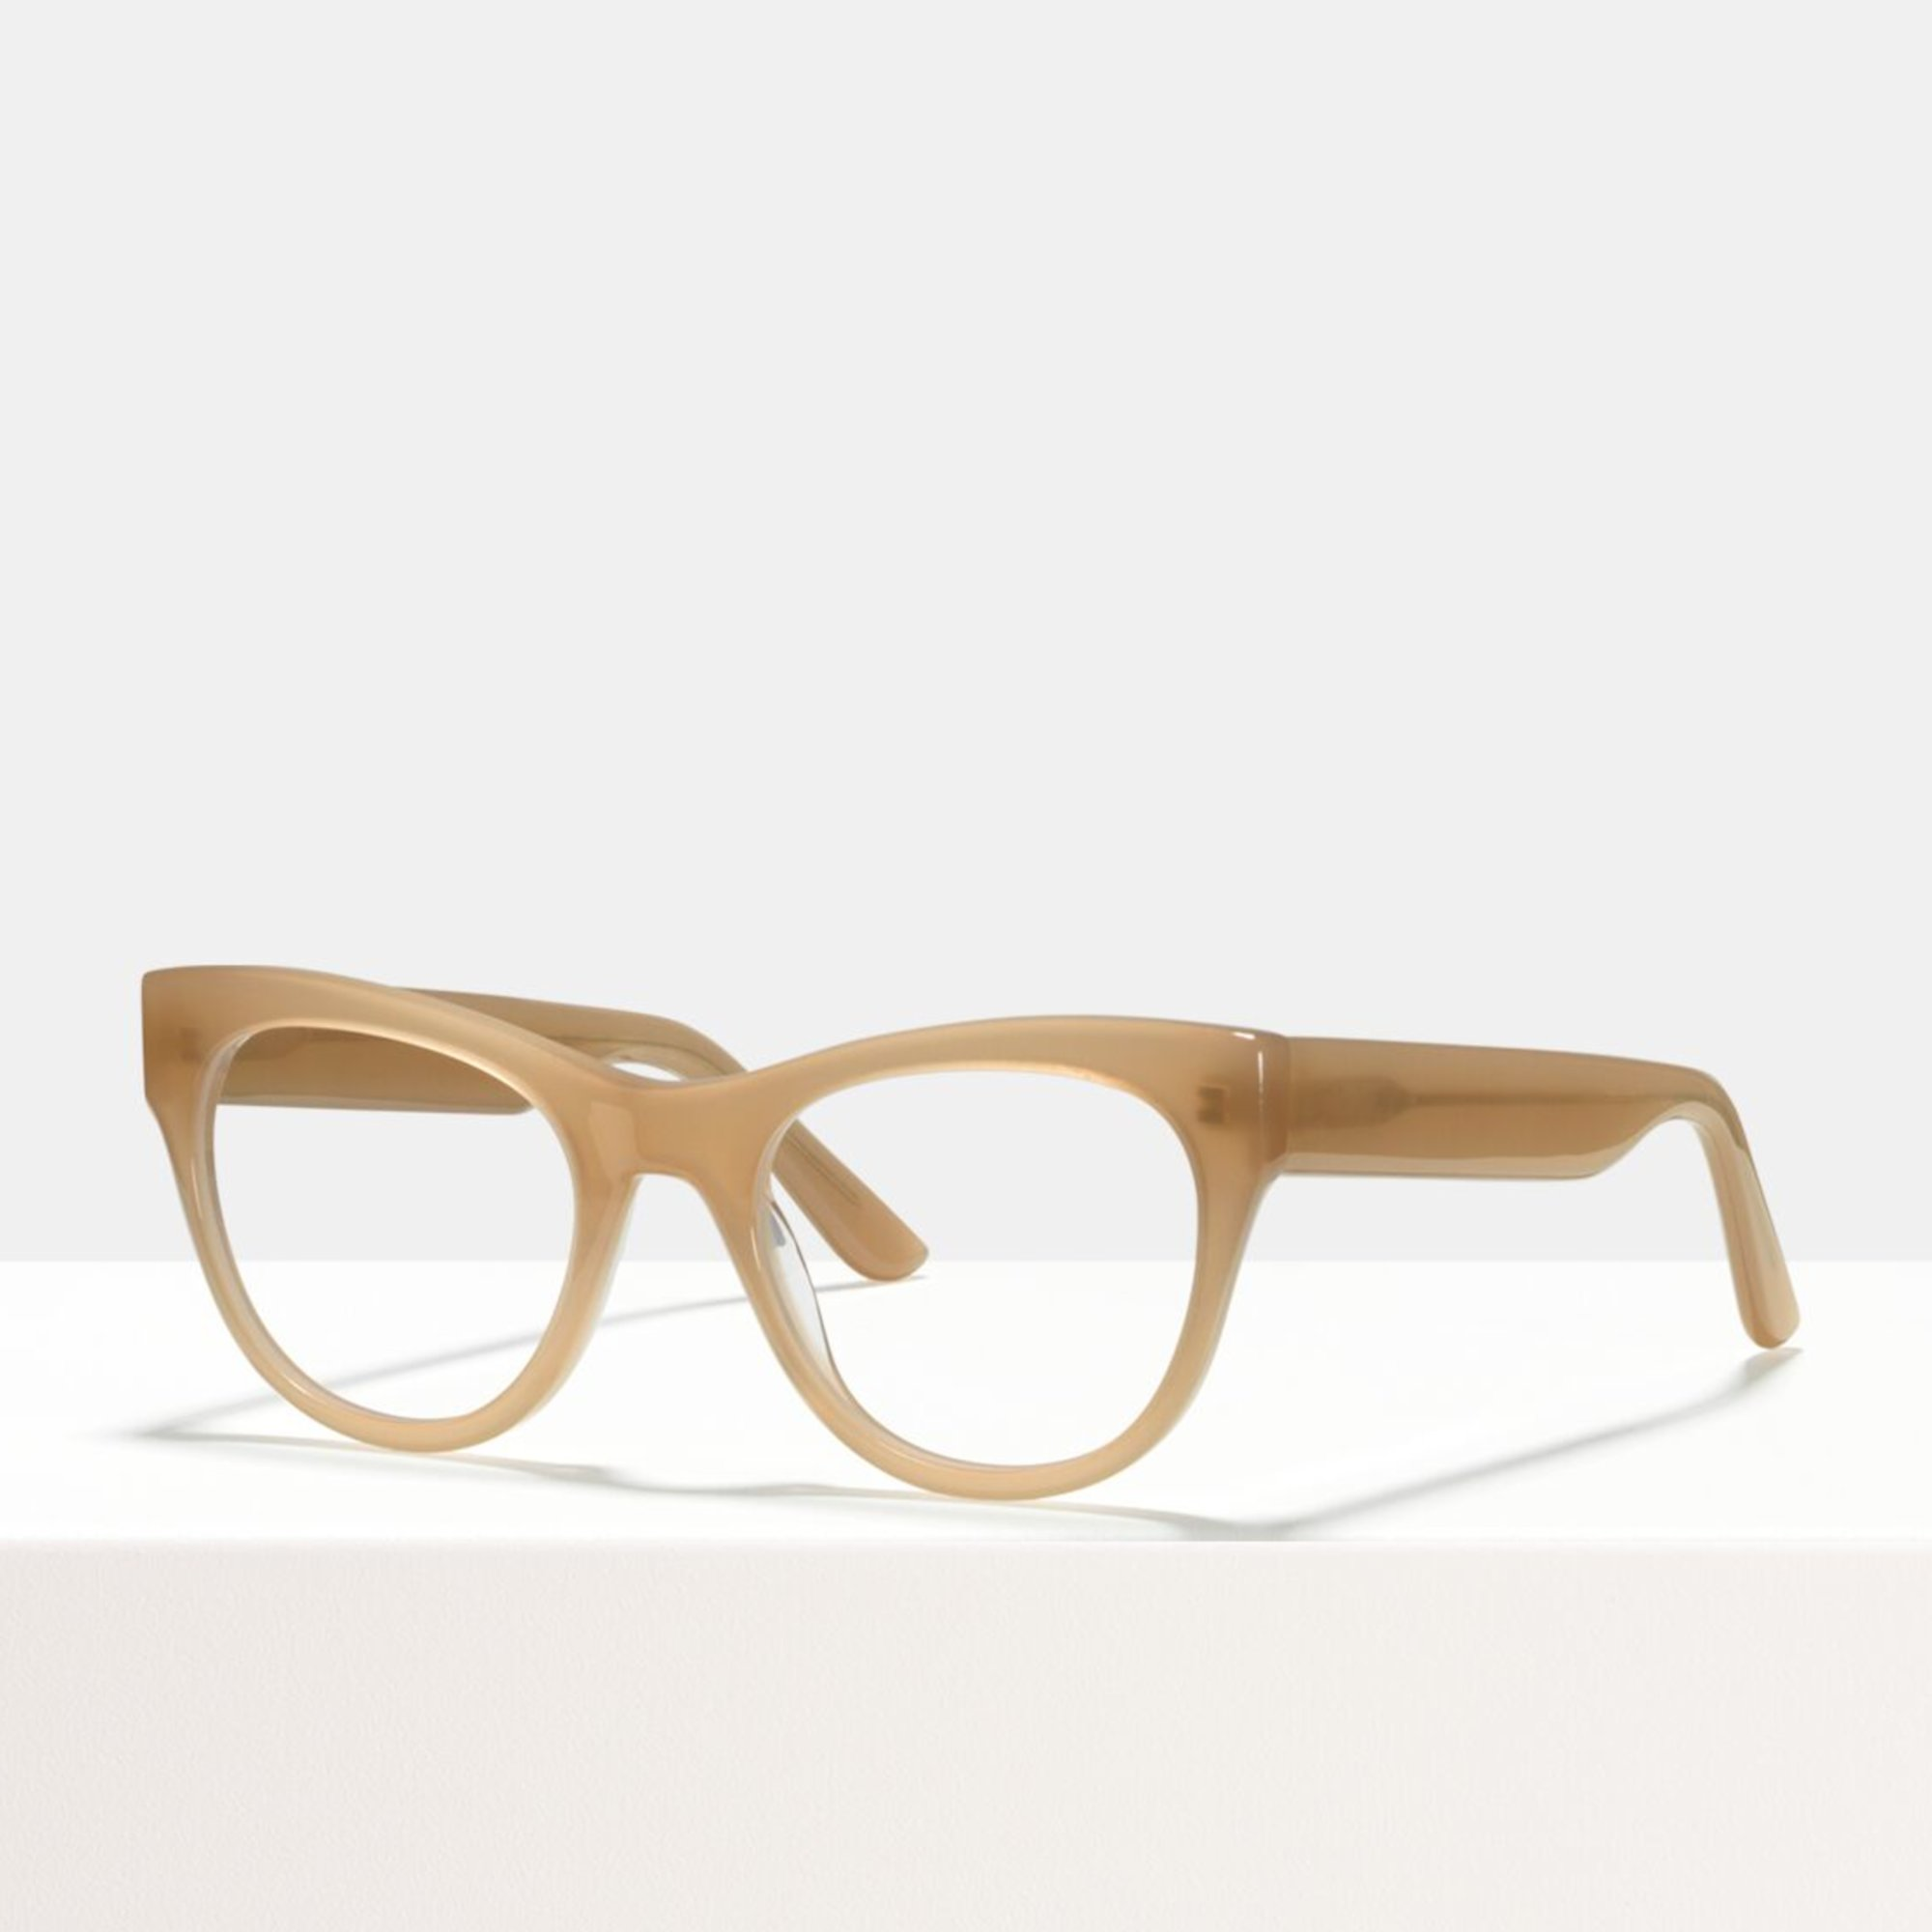 Ace & Tate Glasses   round acetate in Beige